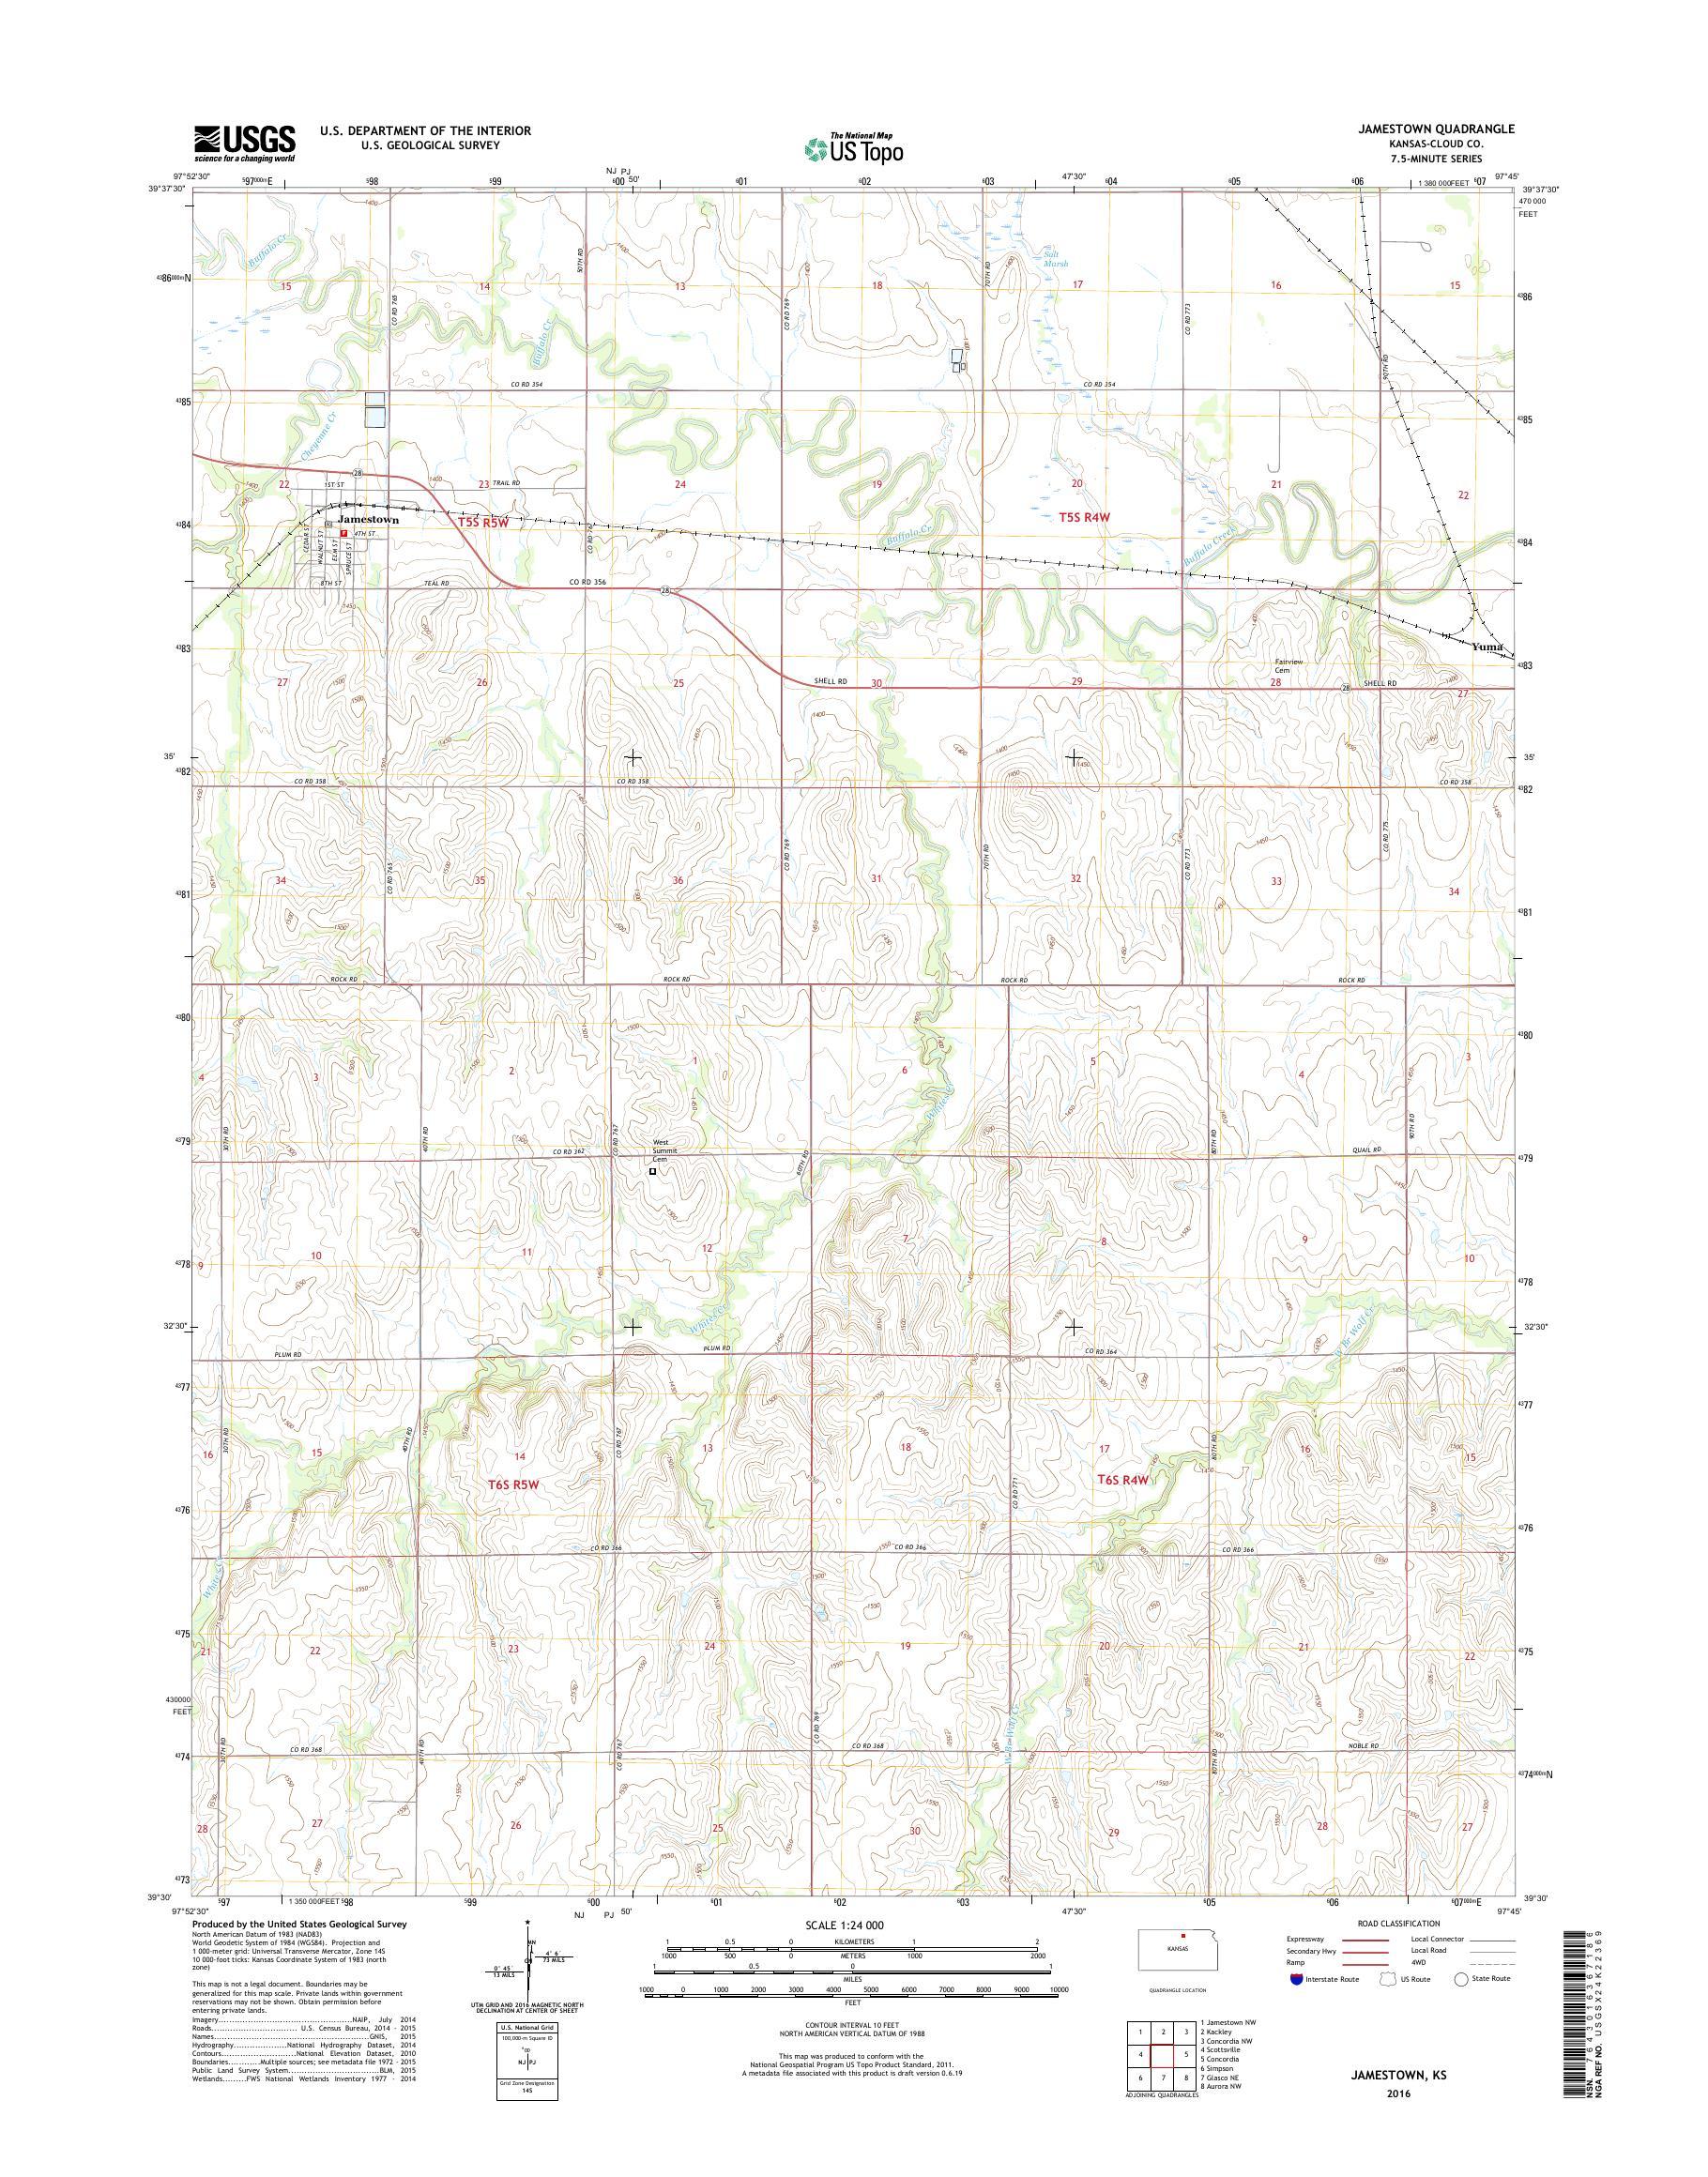 MyTopo Jamestown, Kansas USGS Quad Topo Map on us map bismarck, us map cape girardeau, us map ashland, us map dover, us map thirteen colonies, us map columbia, us map exeter, us map charleston, us map santa fe, us map montgomery, us map philadelphia, us map new england colonies, us map virginia, us map morgantown, us map new amsterdam, us map plymouth, us map pensacola, us map boston, us map mexico city, us map springfield,